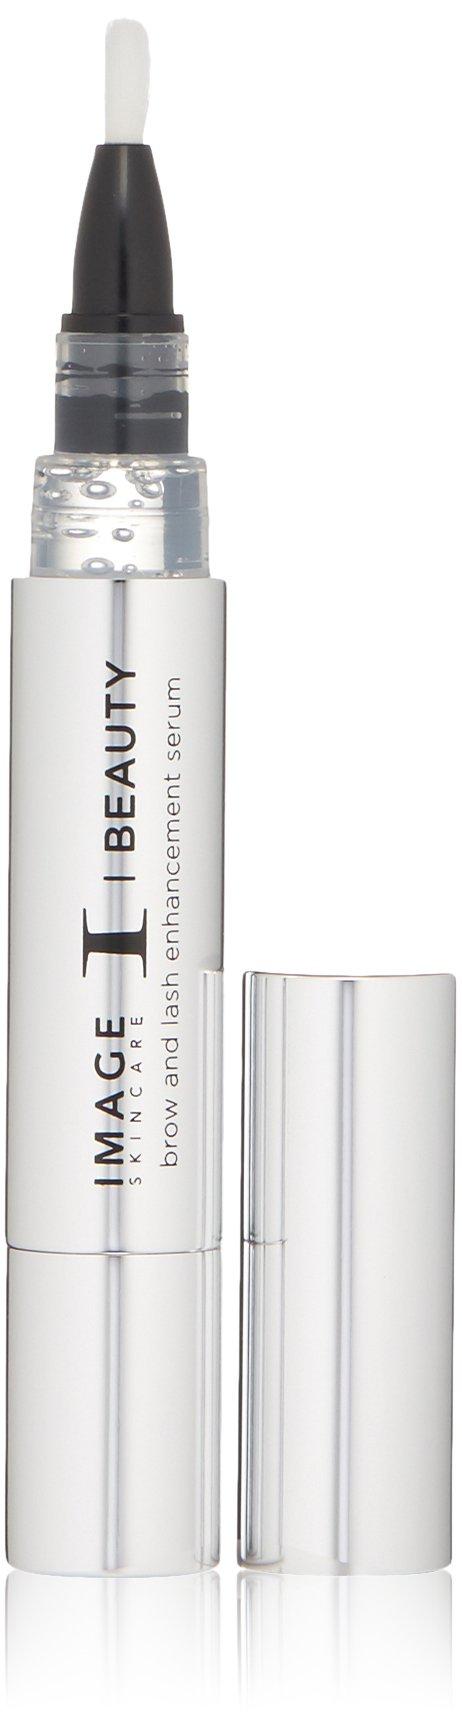 IMAGE Skincare I Beauty Brow and Lash Enhancement Serum, 0.14 oz.